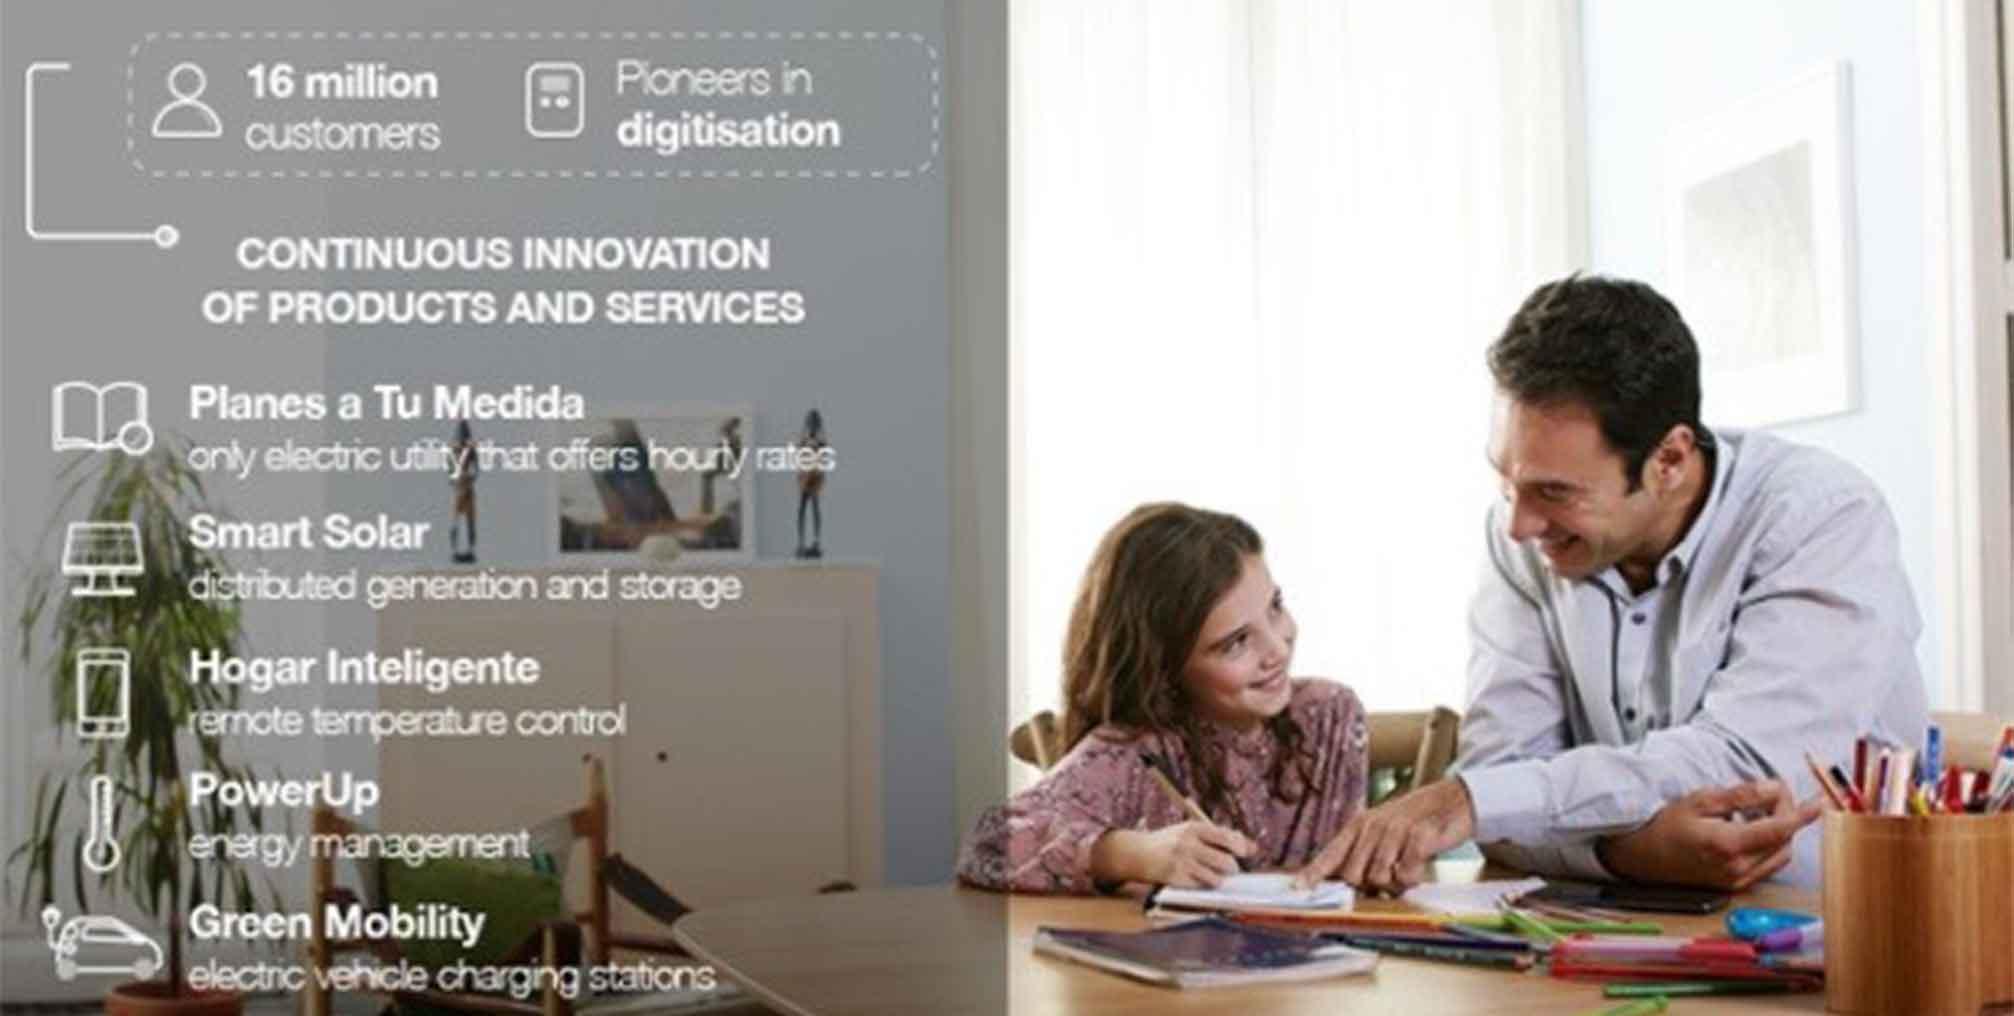 Iberdrola Smart Solutions